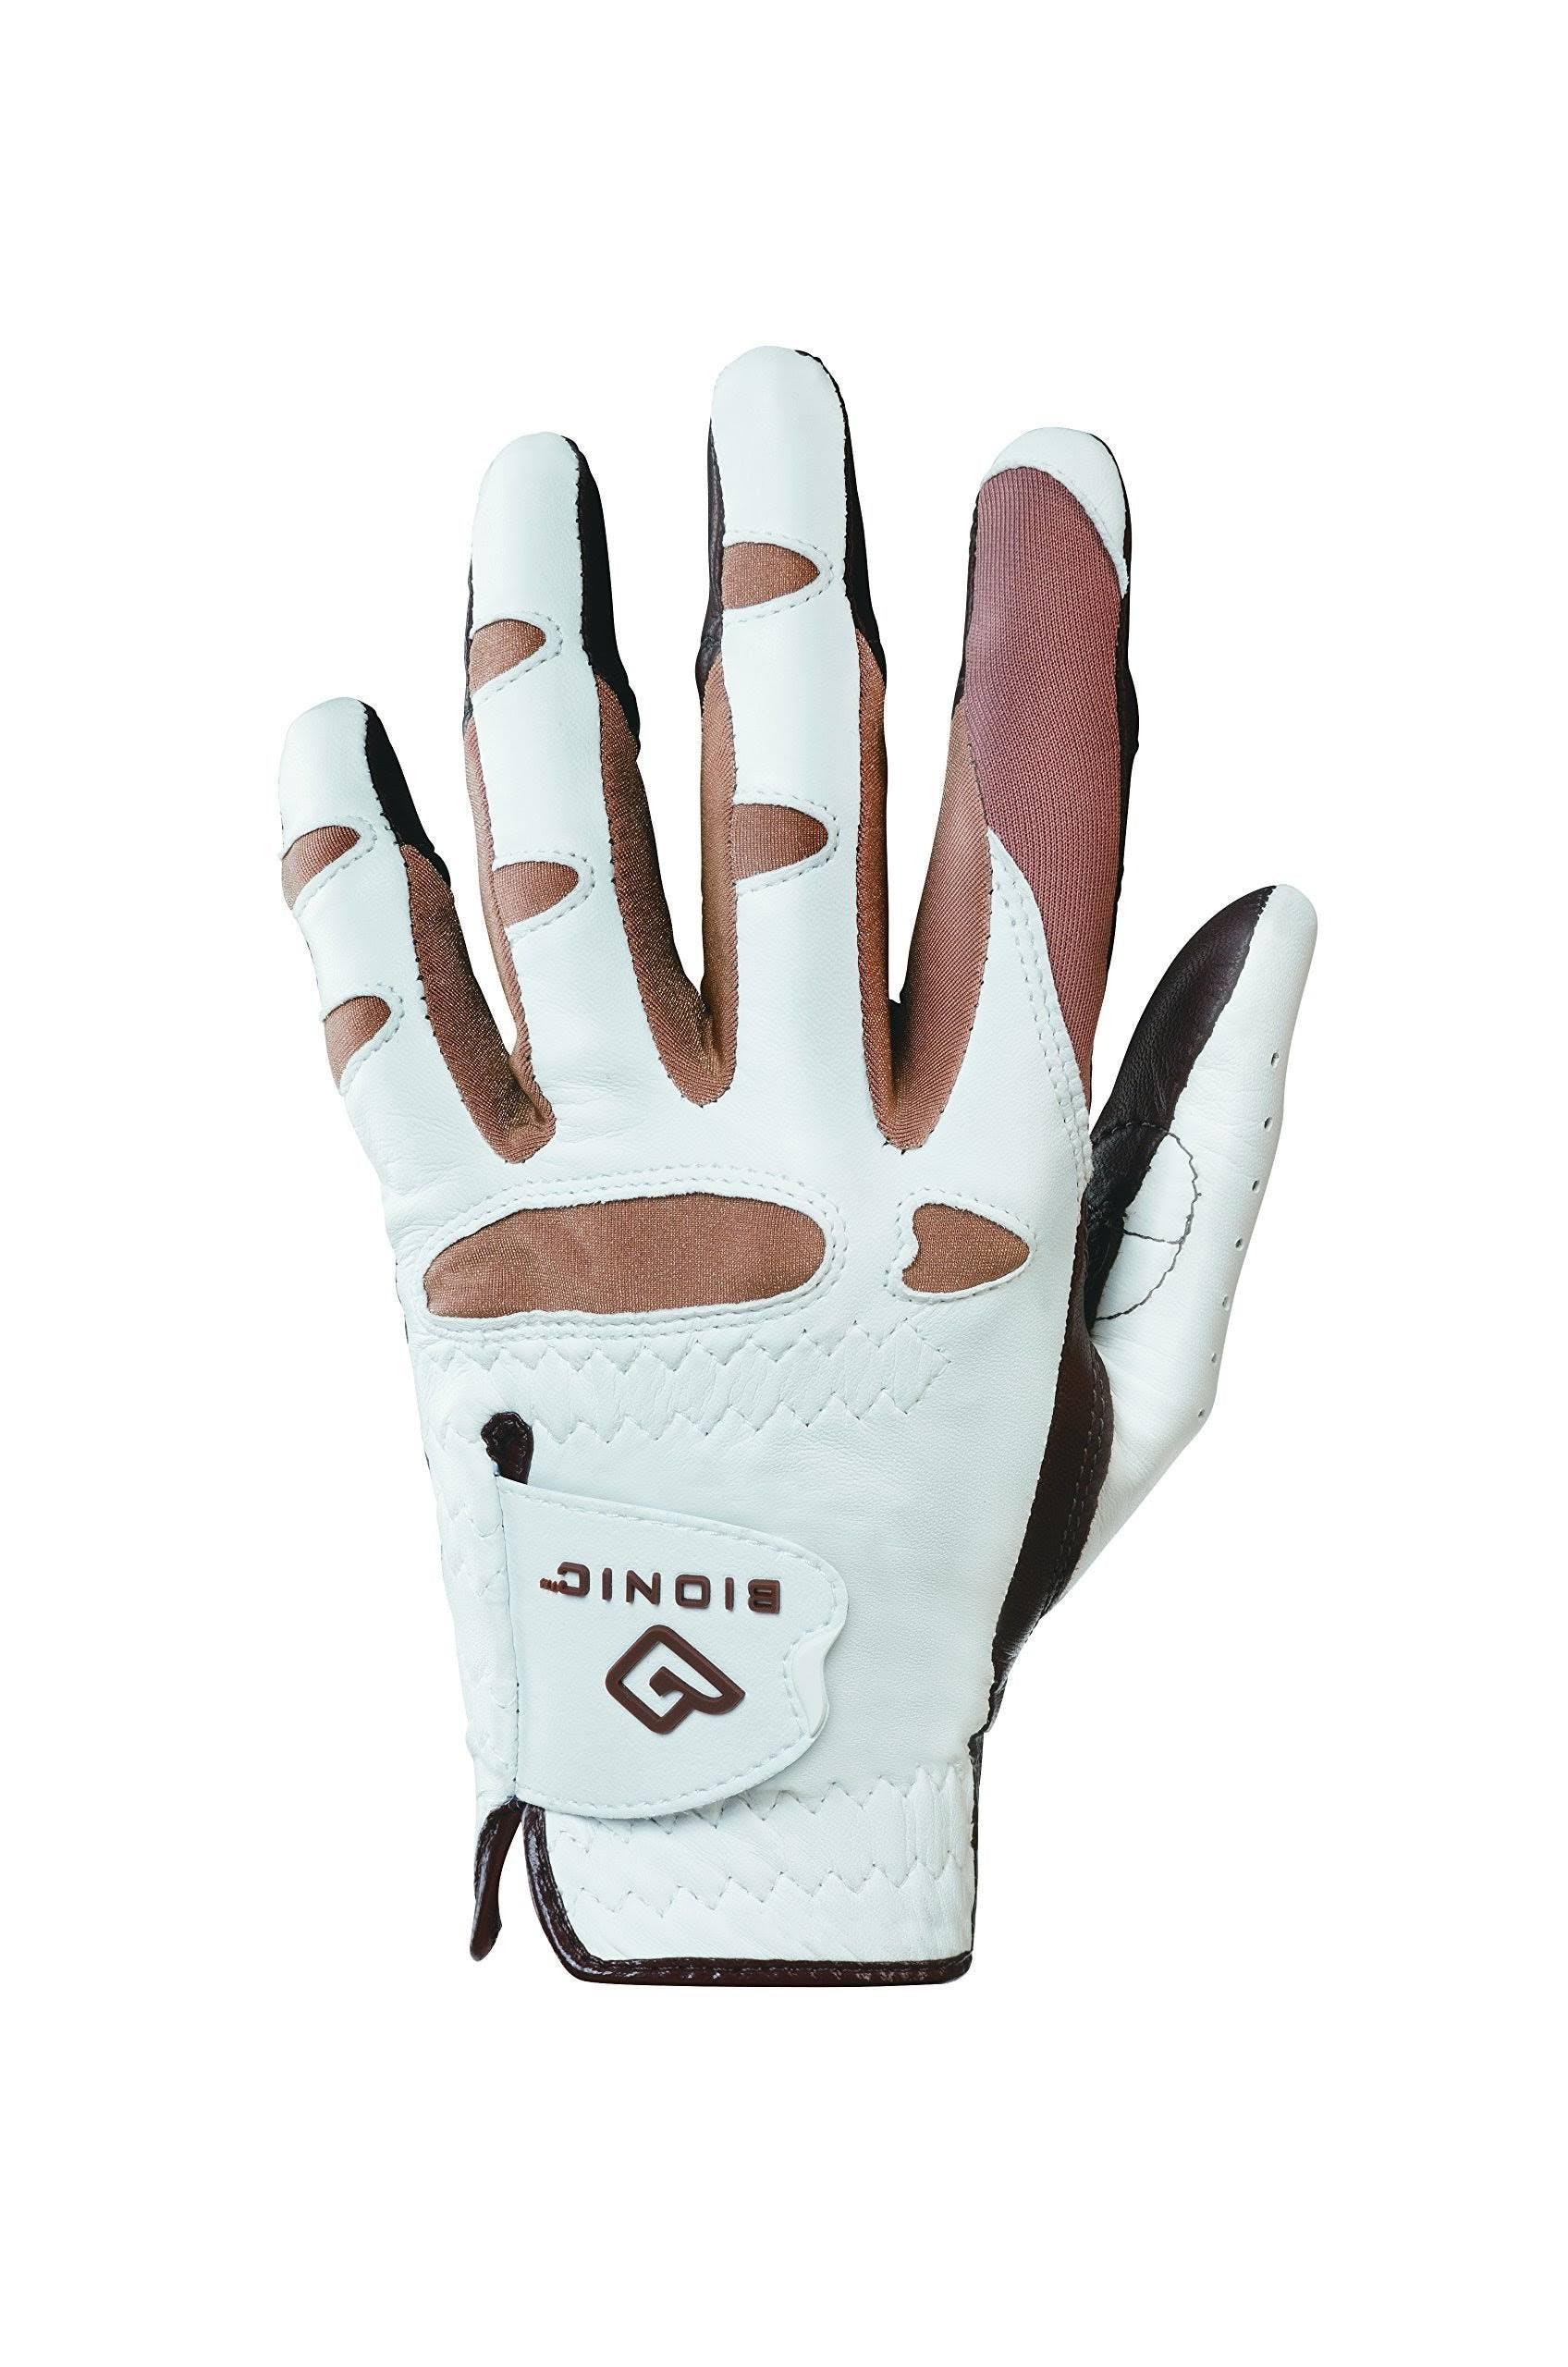 Bionic Women's StableGrip Golf Glove, Size: Medium/Large, White